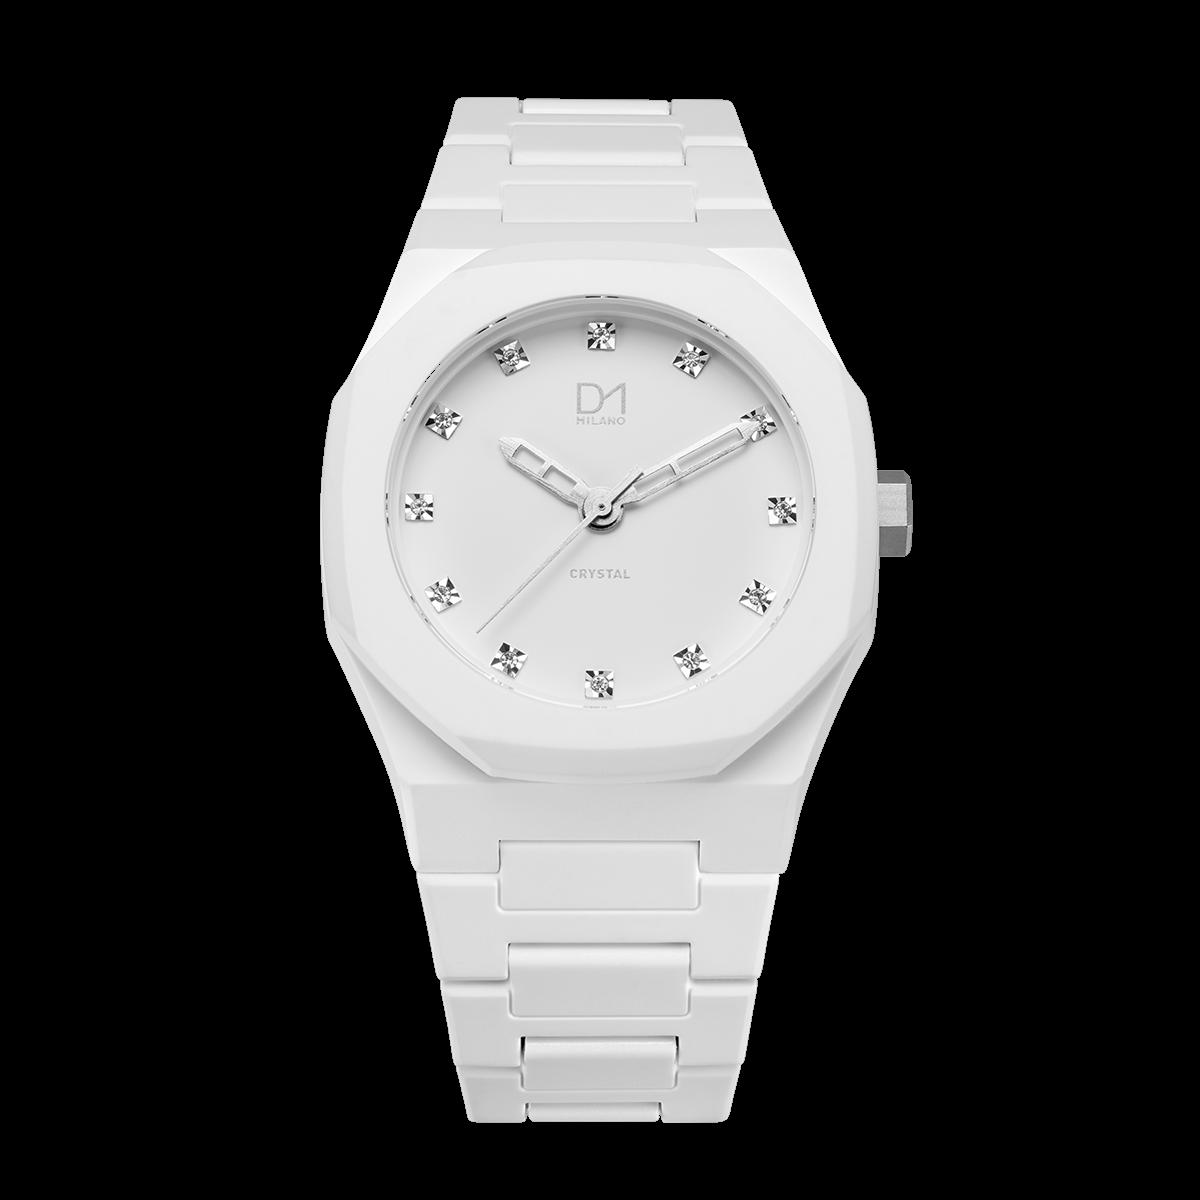 Markenuhrenamp; Shop D1 Online Milano Schmuck Time DamenuhrenRm WHEYID29